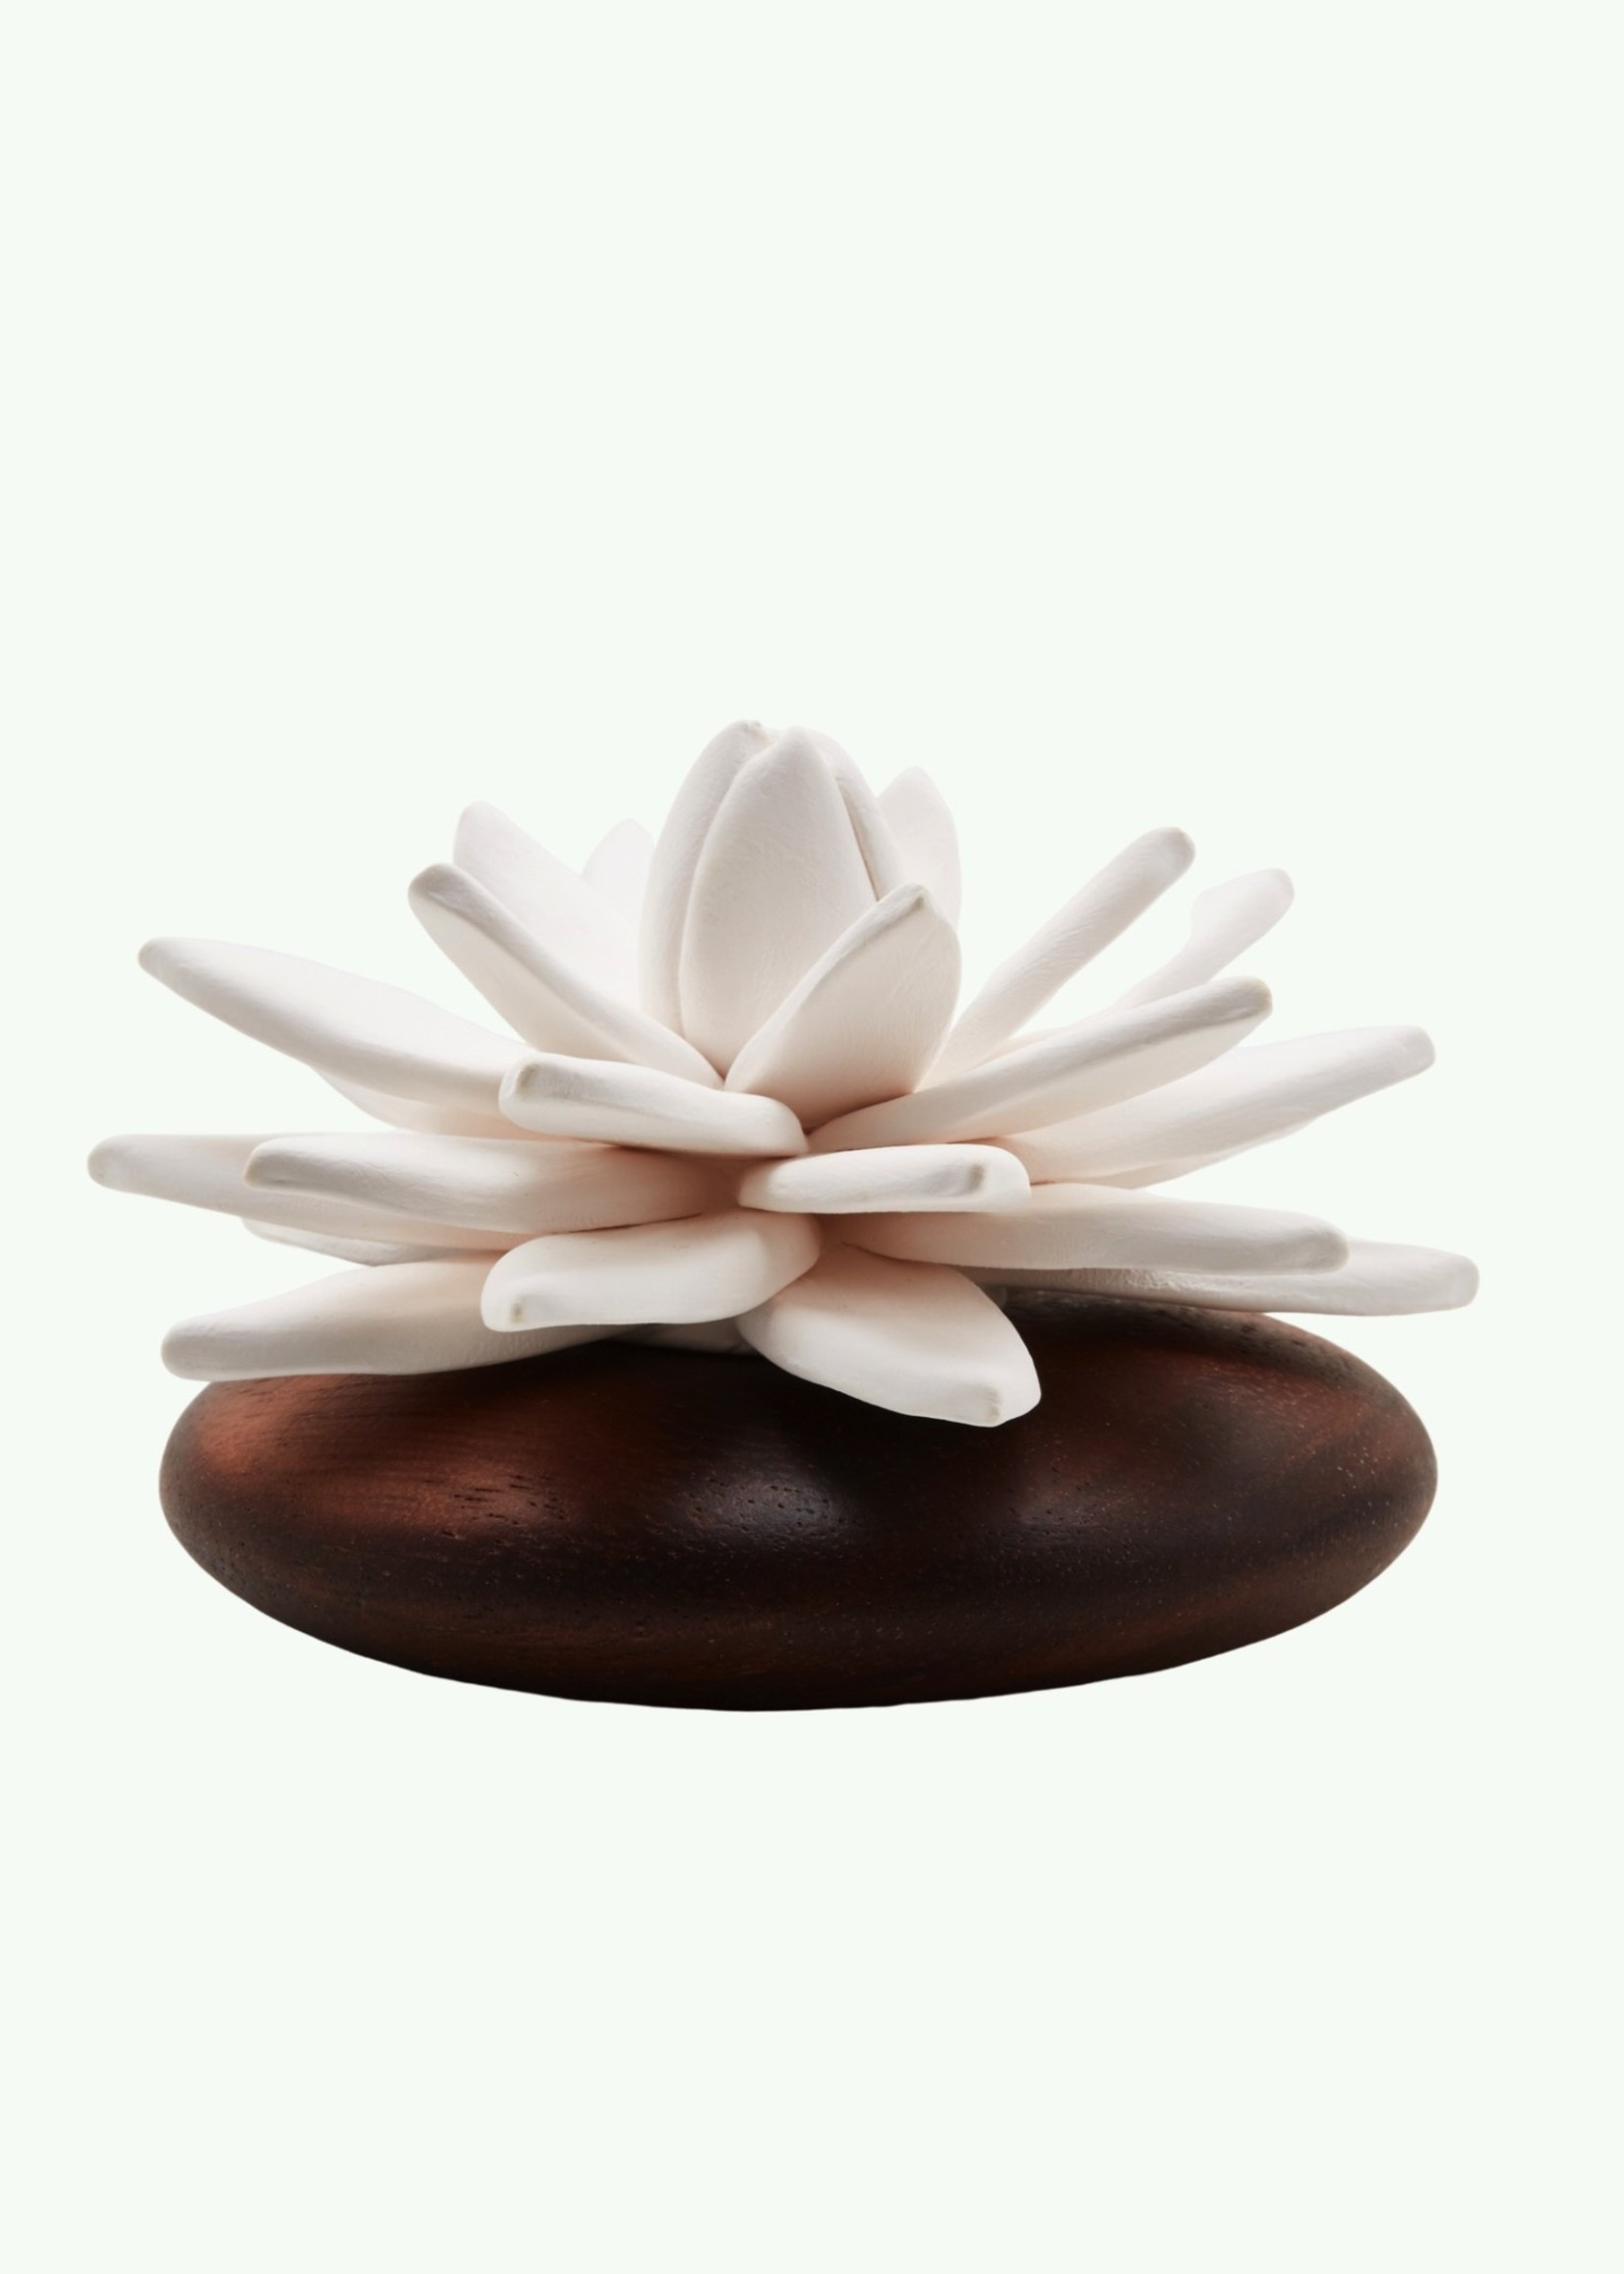 Anoq Anoq - Lotus des Indes - Perfume Diffuser